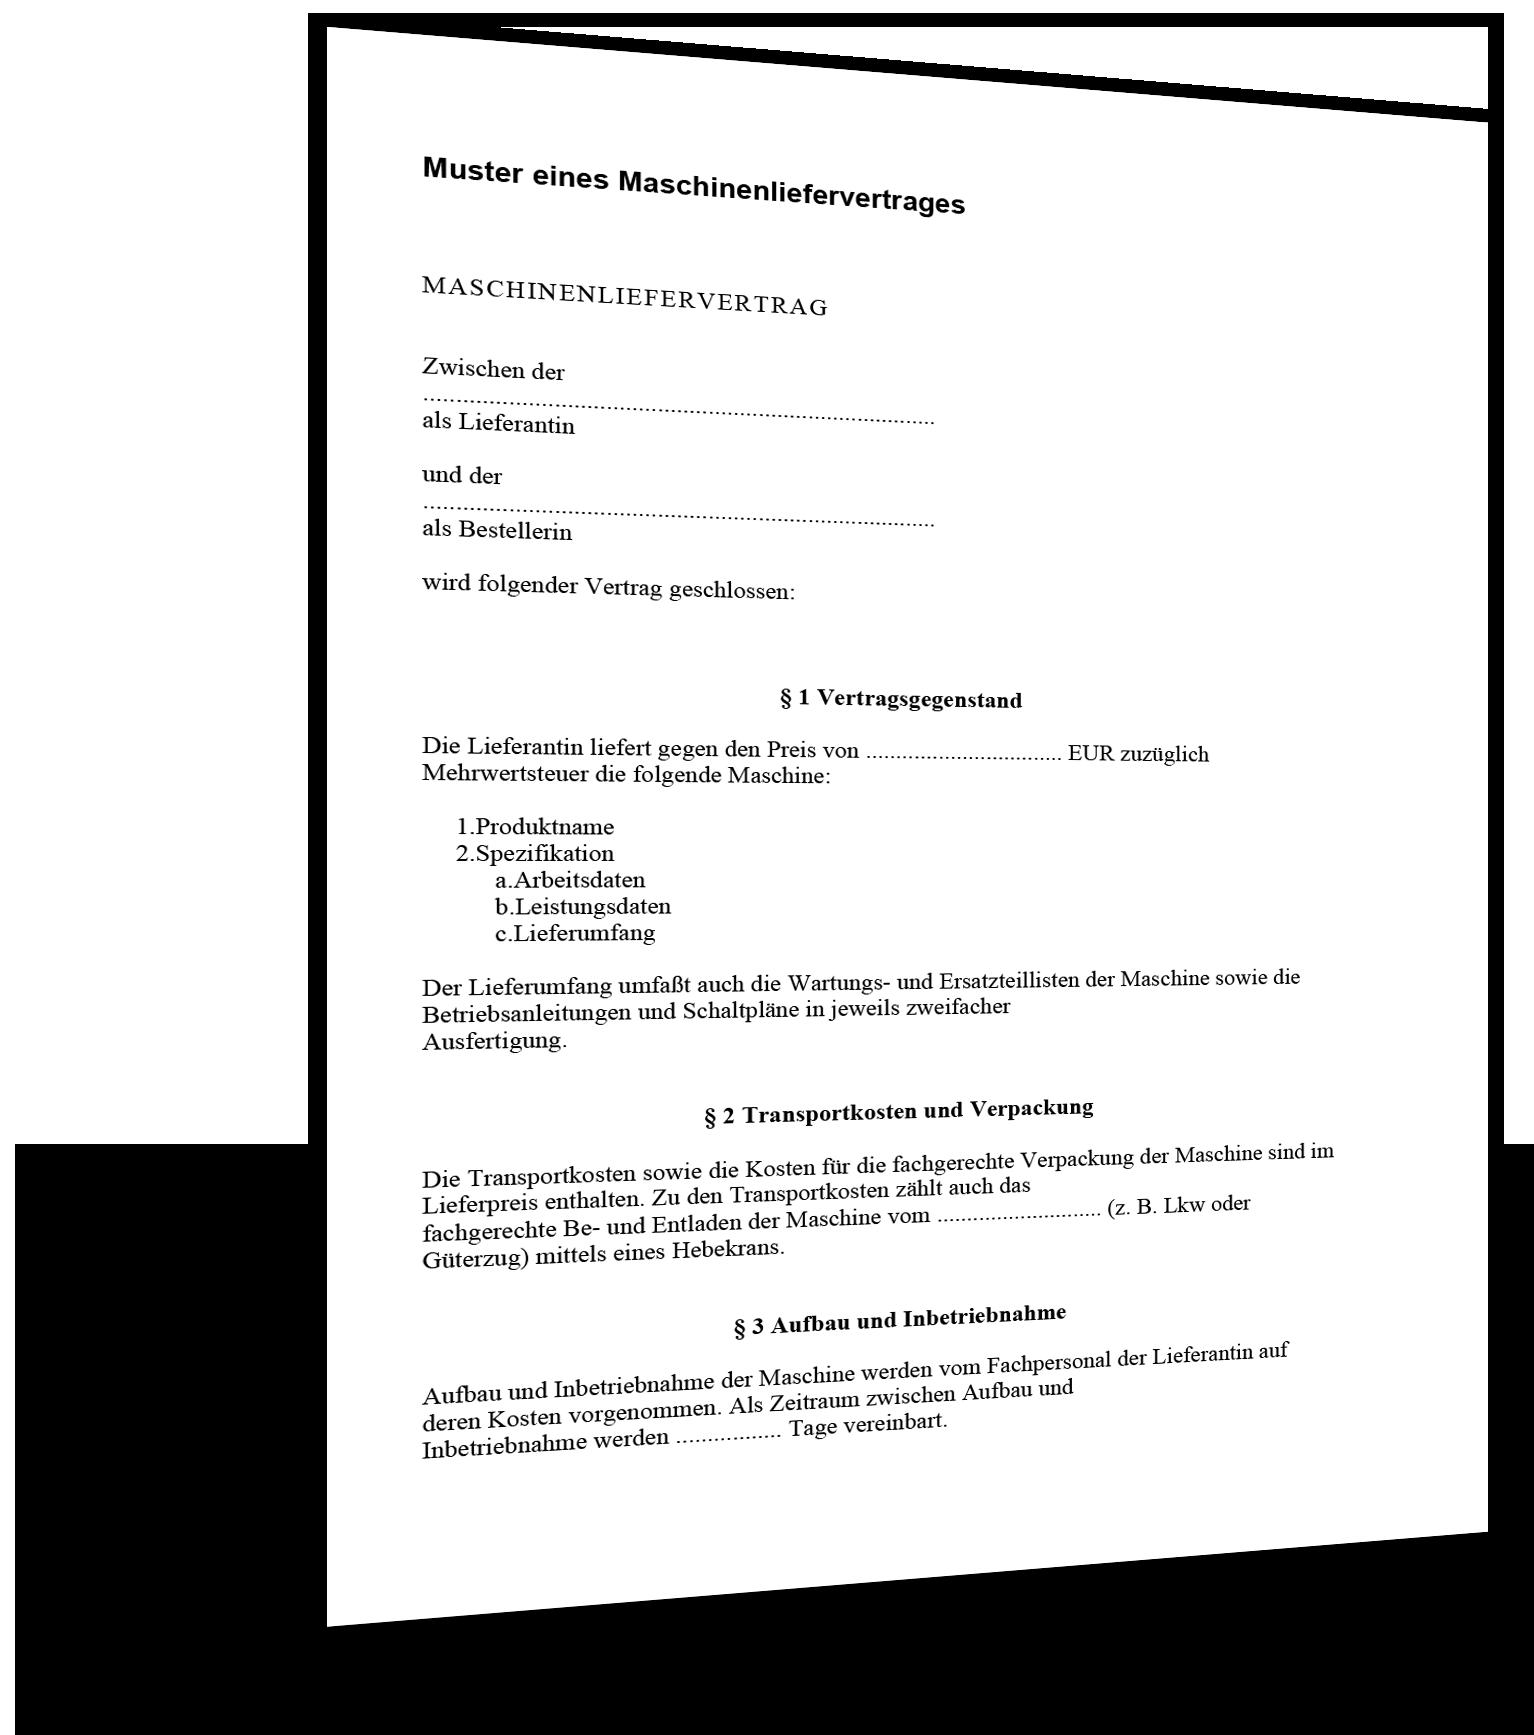 Muster Eines Maschinenliefervertrages Standardvertraegede